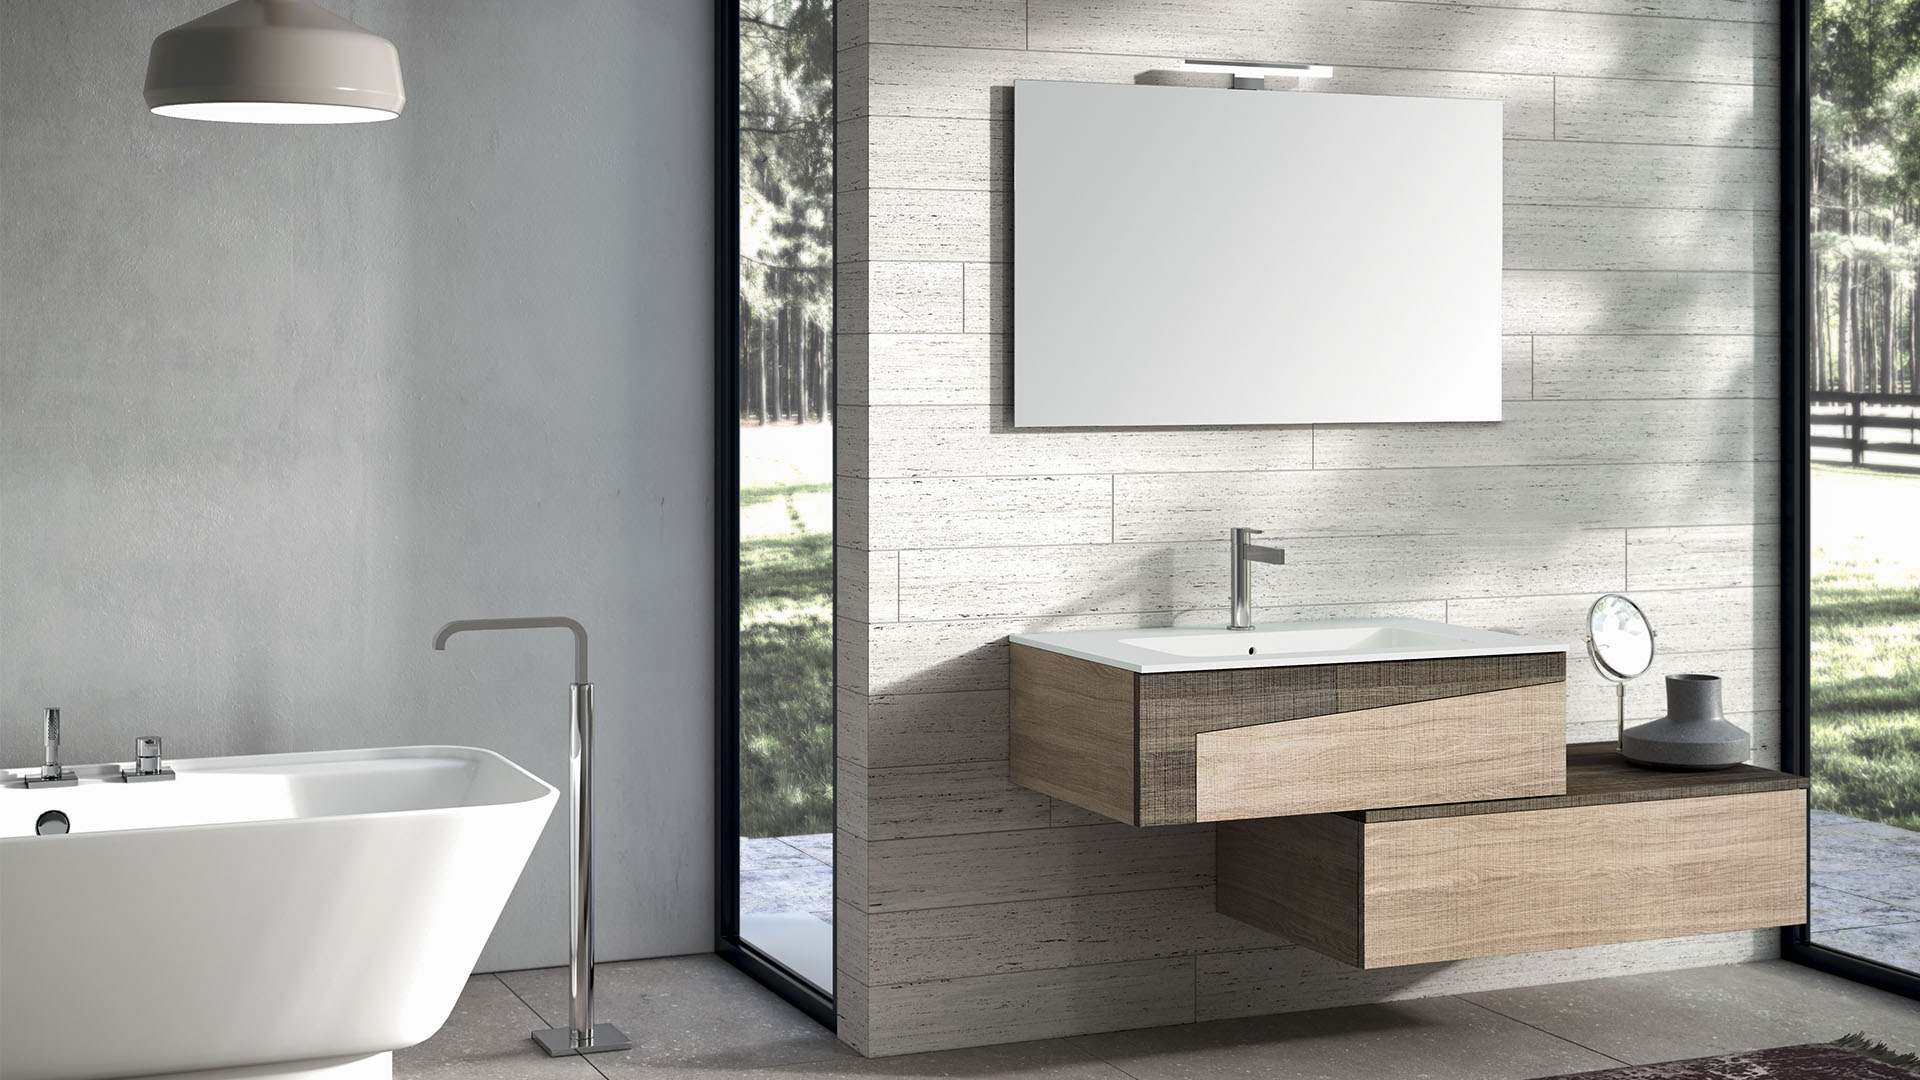 Bathroom K108 - Licor Design